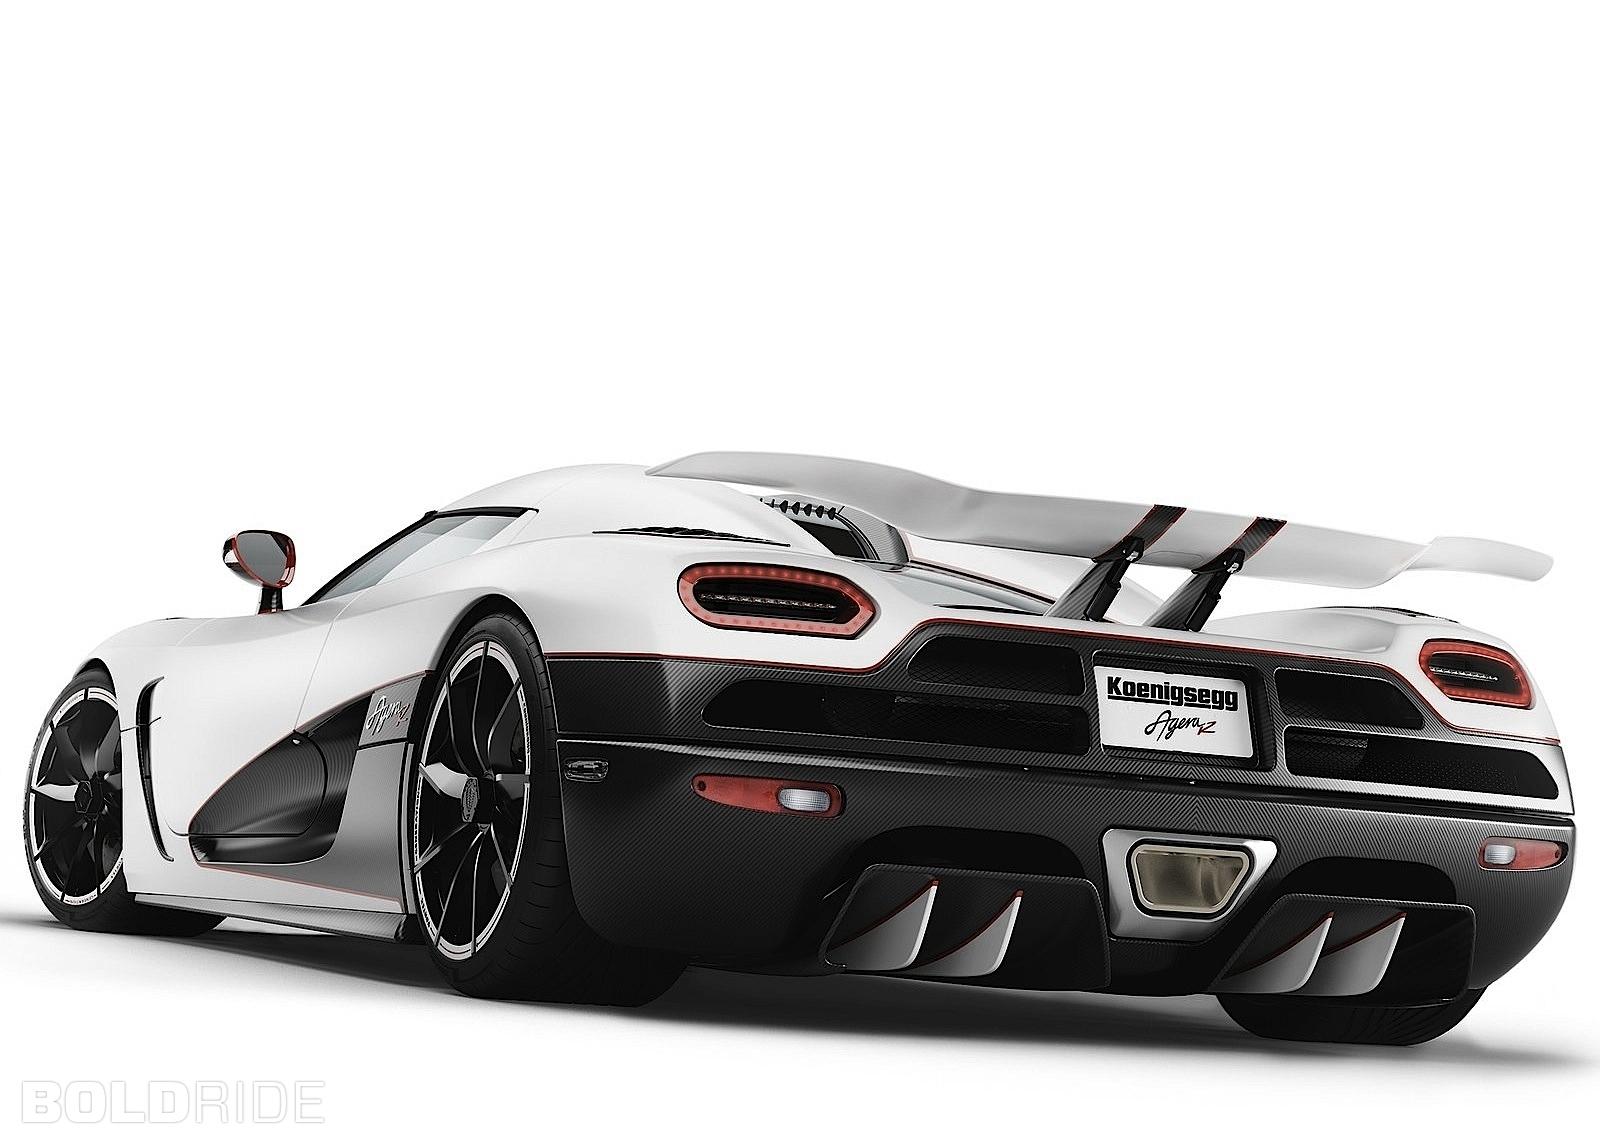 2012 Koenigsegg Agera R | Cars Sketches